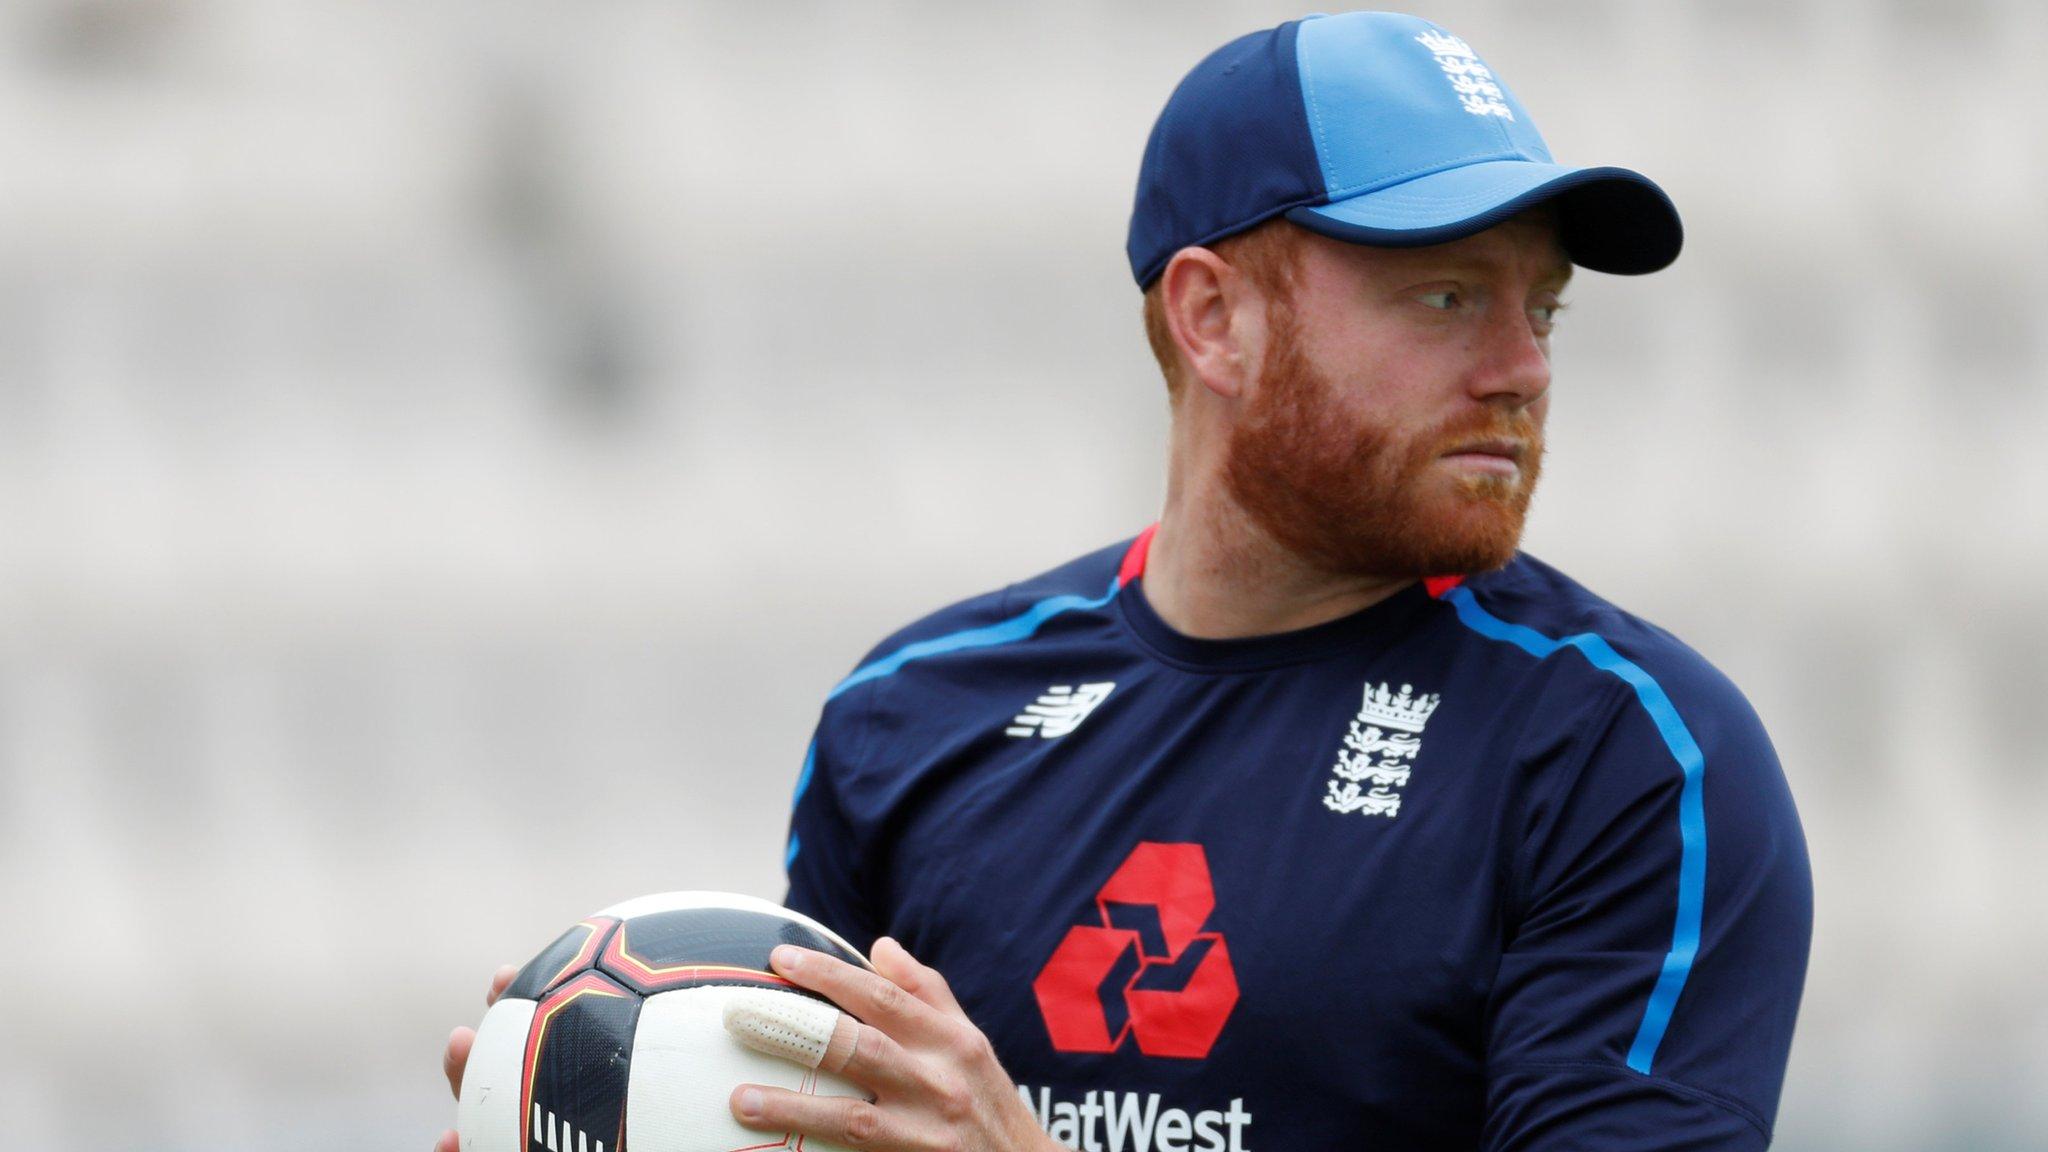 Andy Zaltzman on England v Sri Lanka, Jonny Bairstow & Keaton Jennings